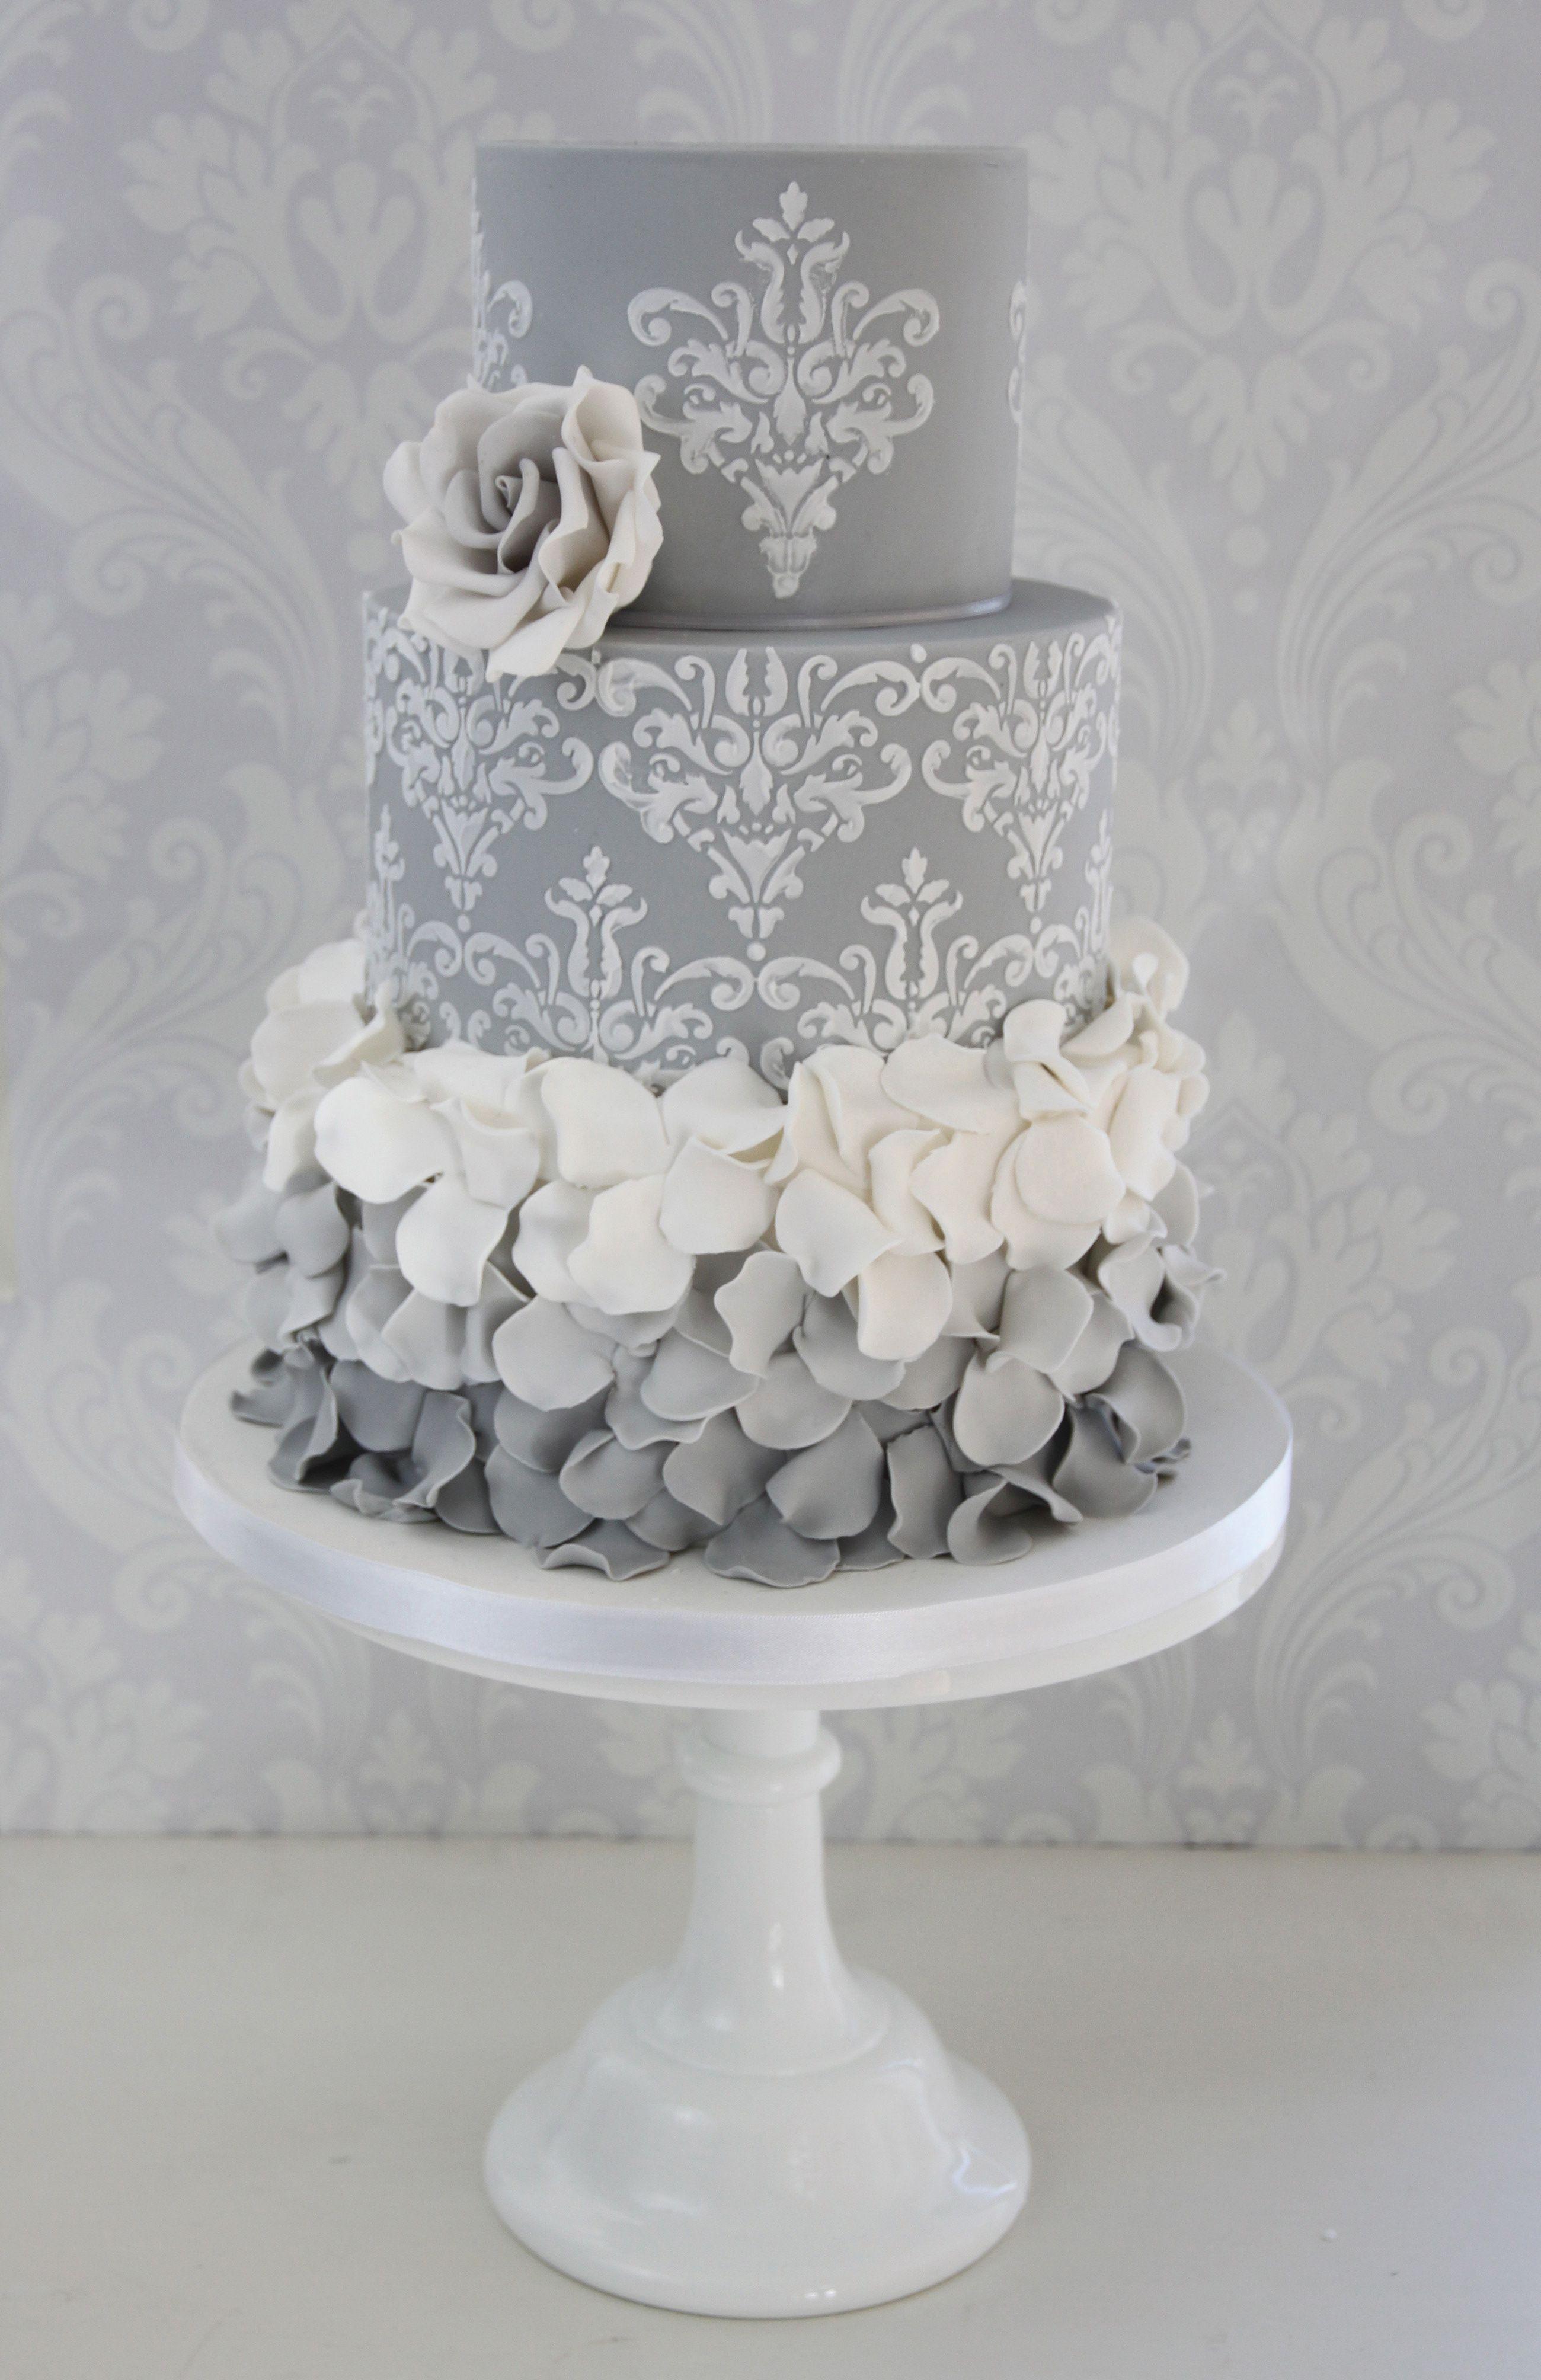 Ombre ruffles design by the enchanting cake company weddingcake